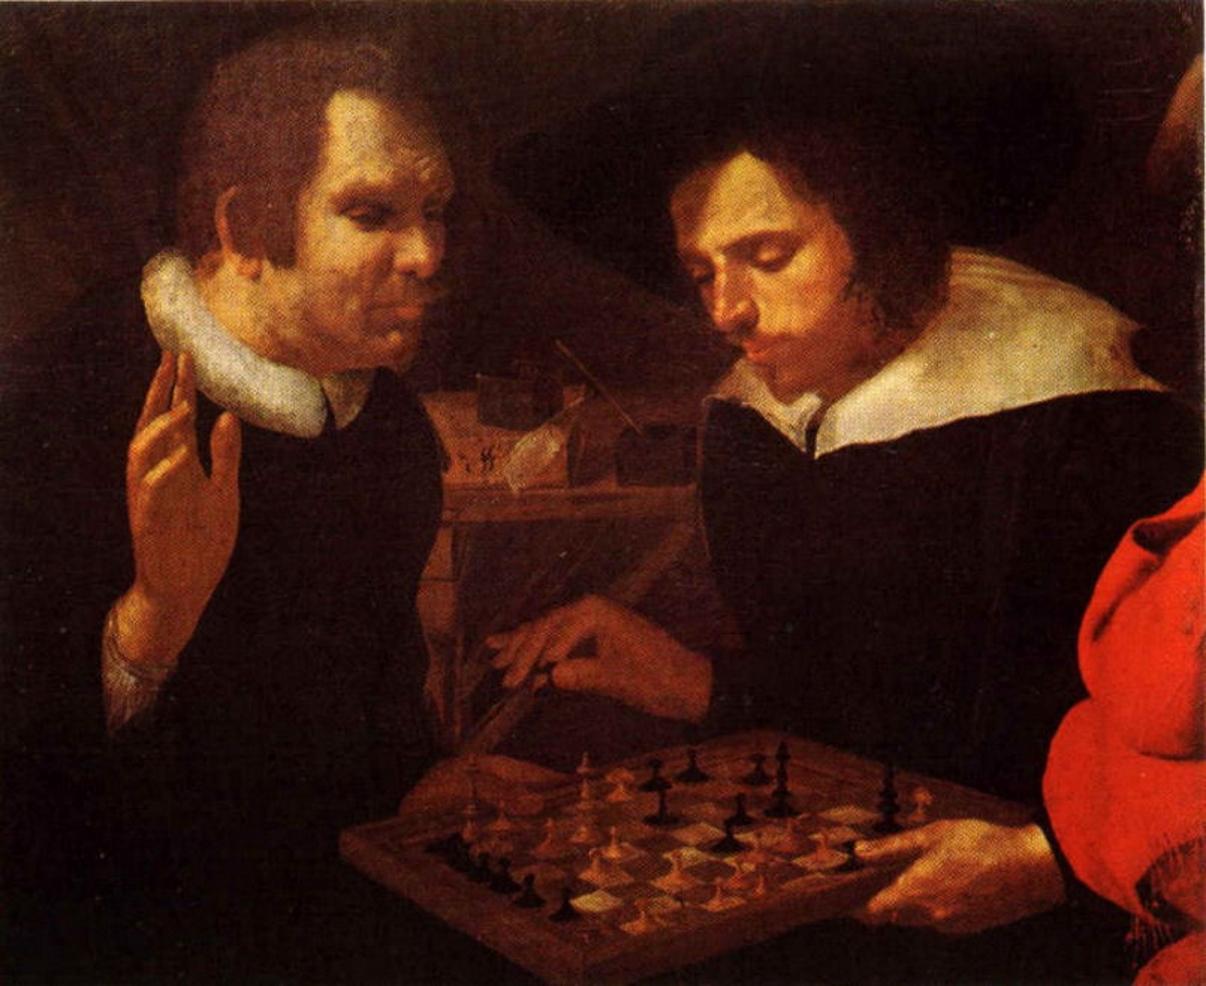 Карел Мандер «Шахматисты» (1603). На картине предположительно изображены Бен Джонсон и Уильям Шекспир